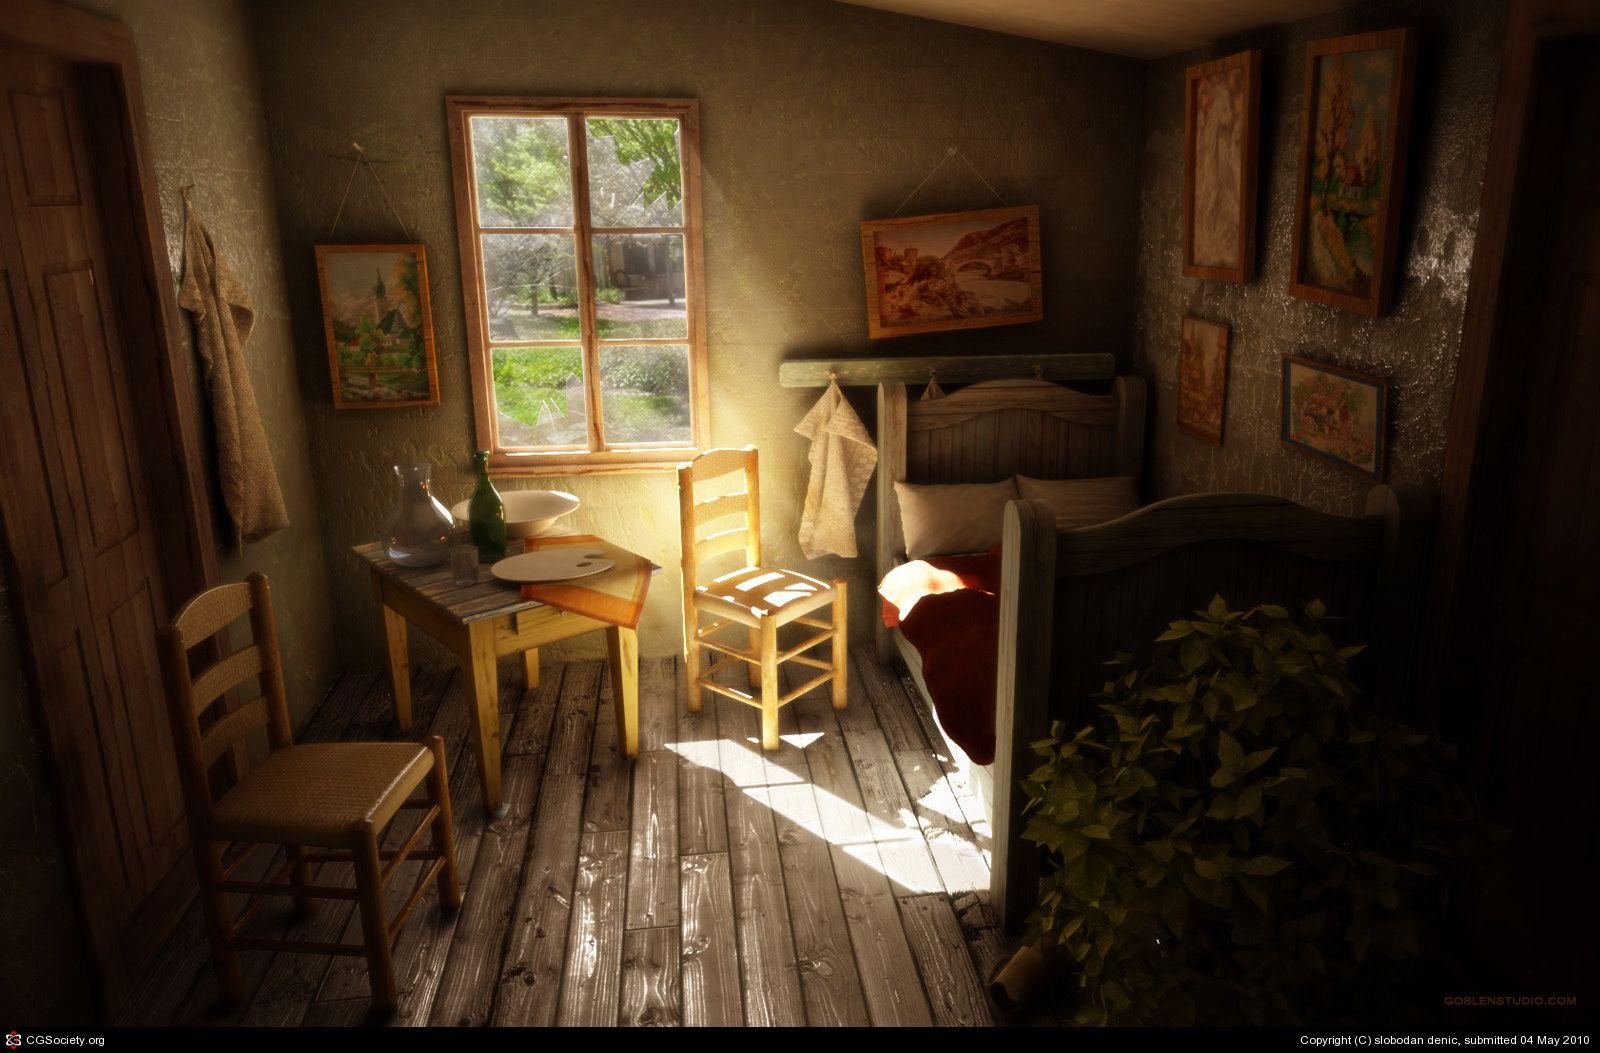 Bedroom In Arles V Van Gogh By Slobodan Denic 3d Cgsociety Van Gogh Bedroom In Arles Vincent Van Gogh,The Animals House Of The Rising Sun Chords Guitar